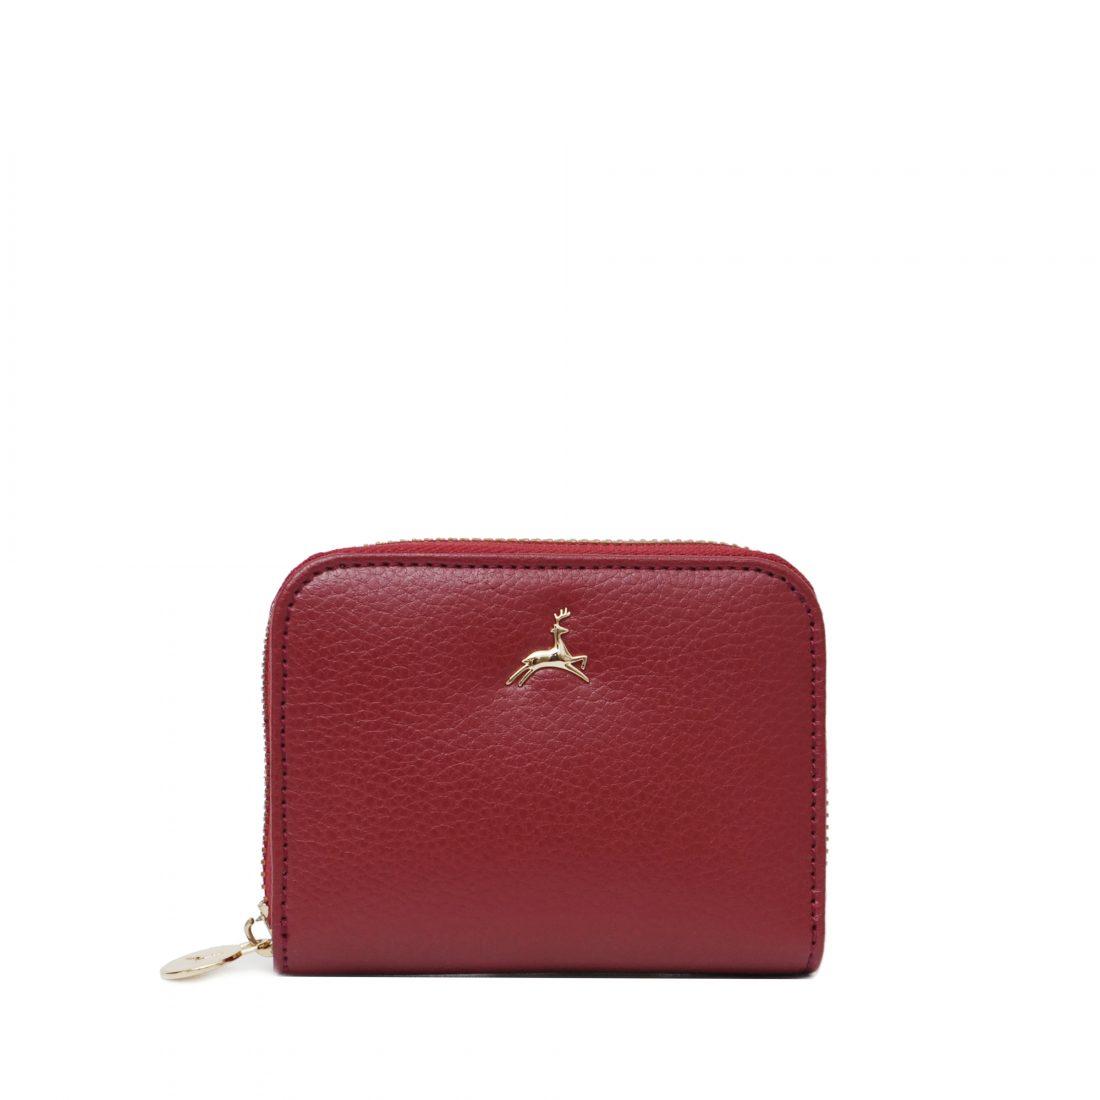 akordia-wallet-red-1